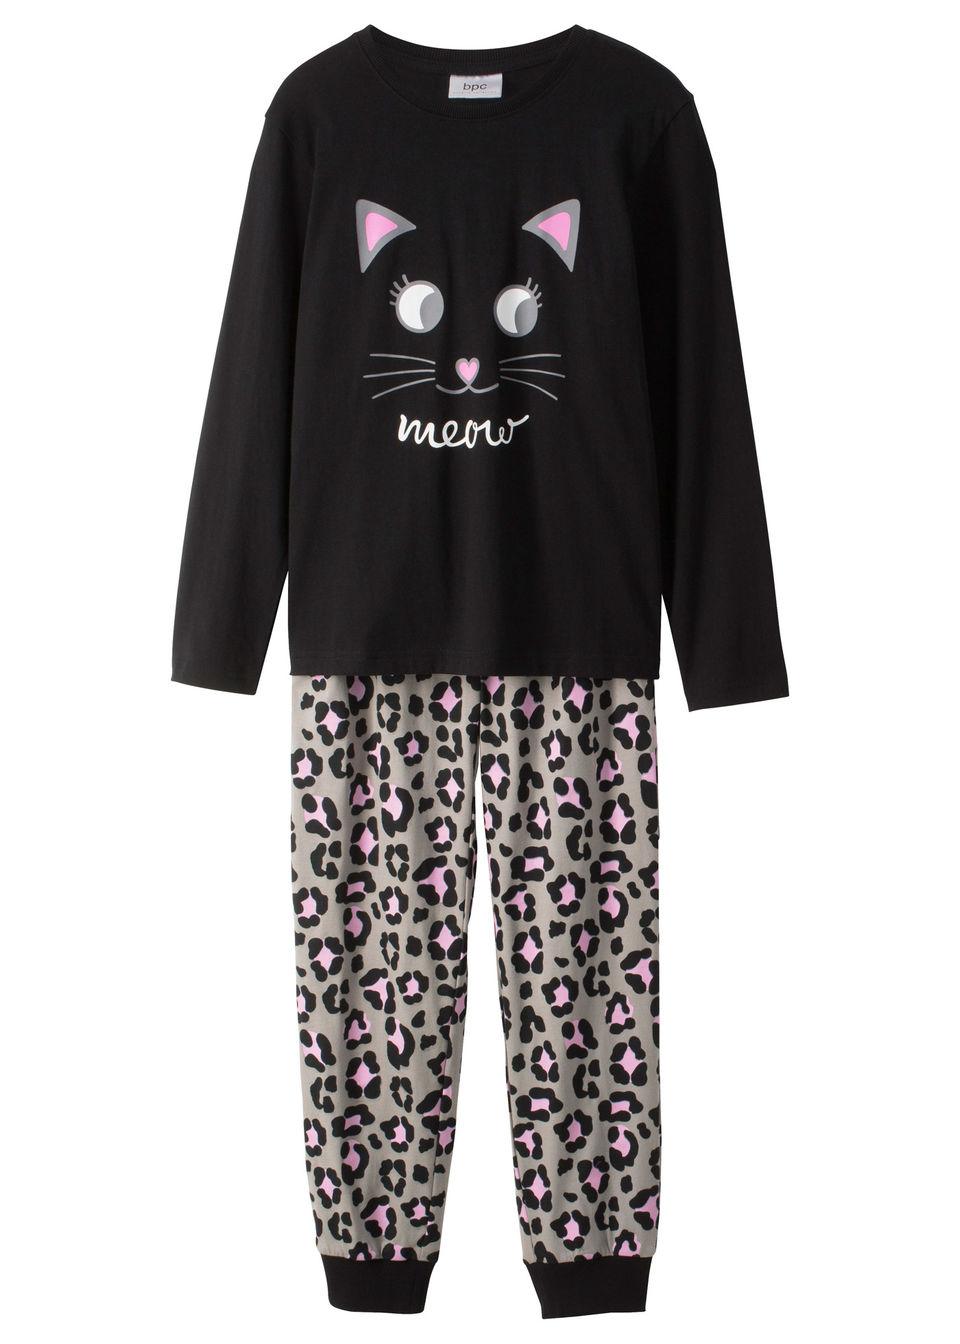 Pijama (set/2piese) bonprix